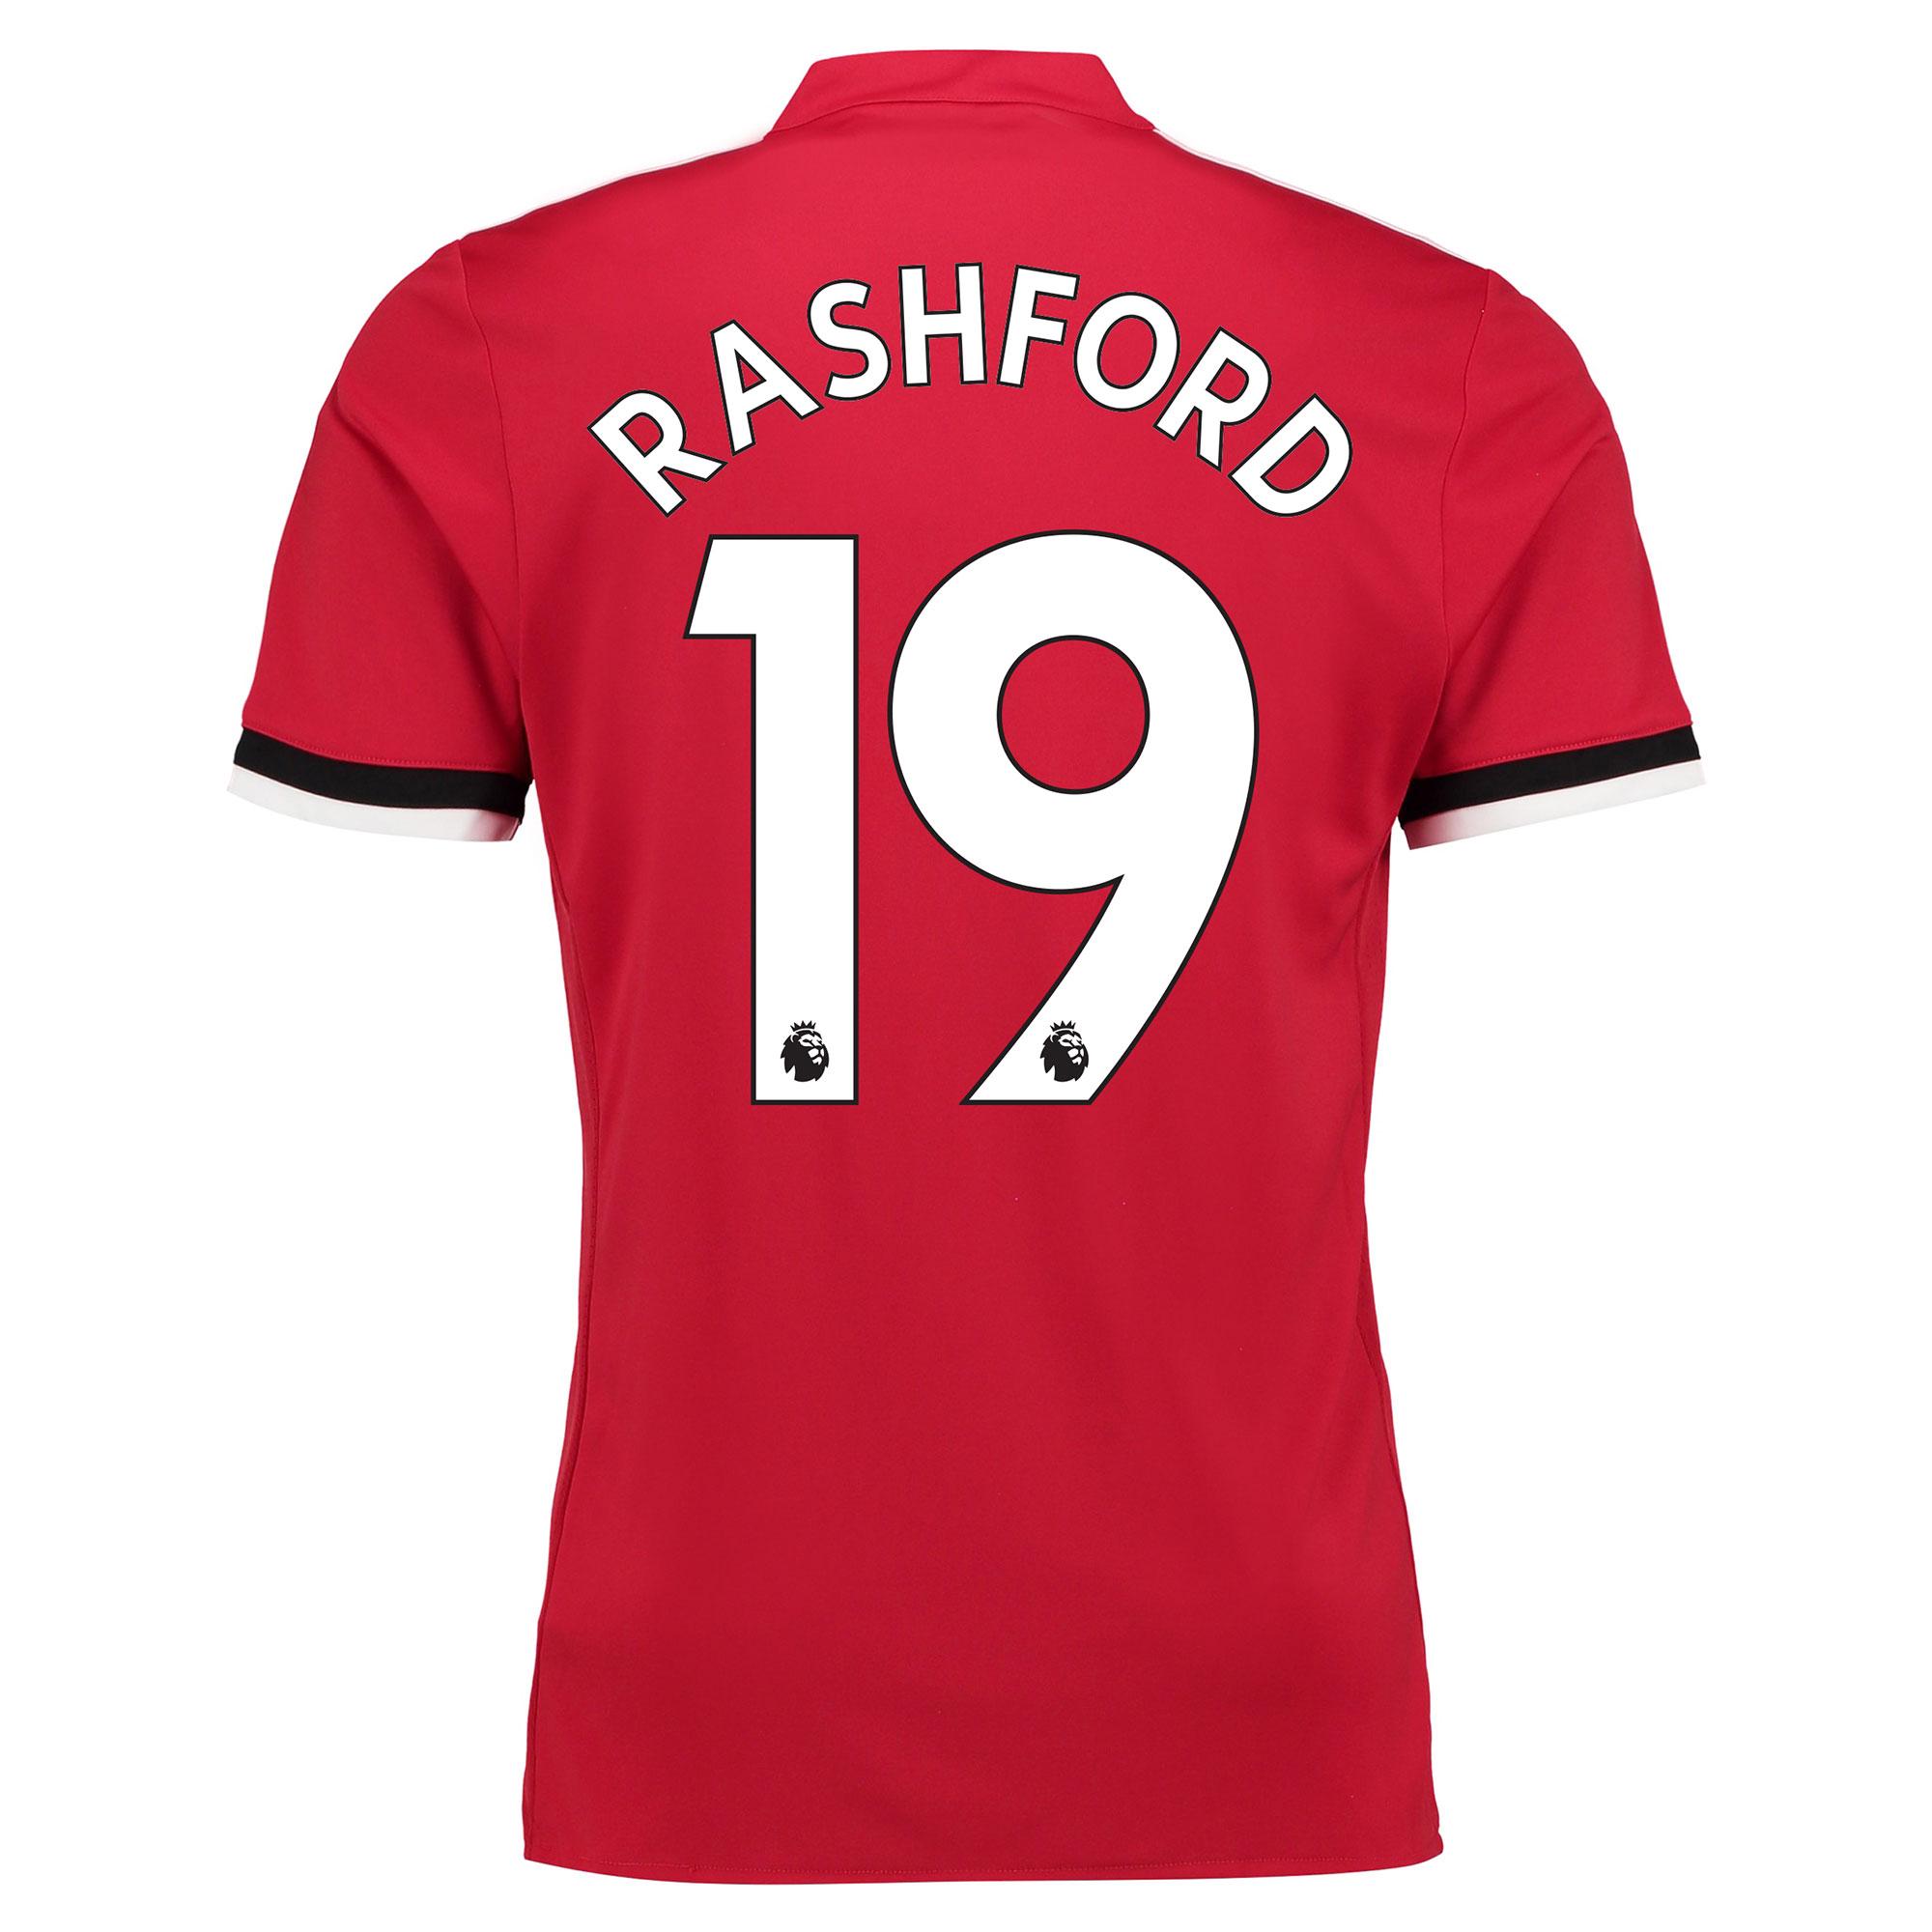 Manchester United Home Shirt 2017-18 - Kids with Rashford 19 printing